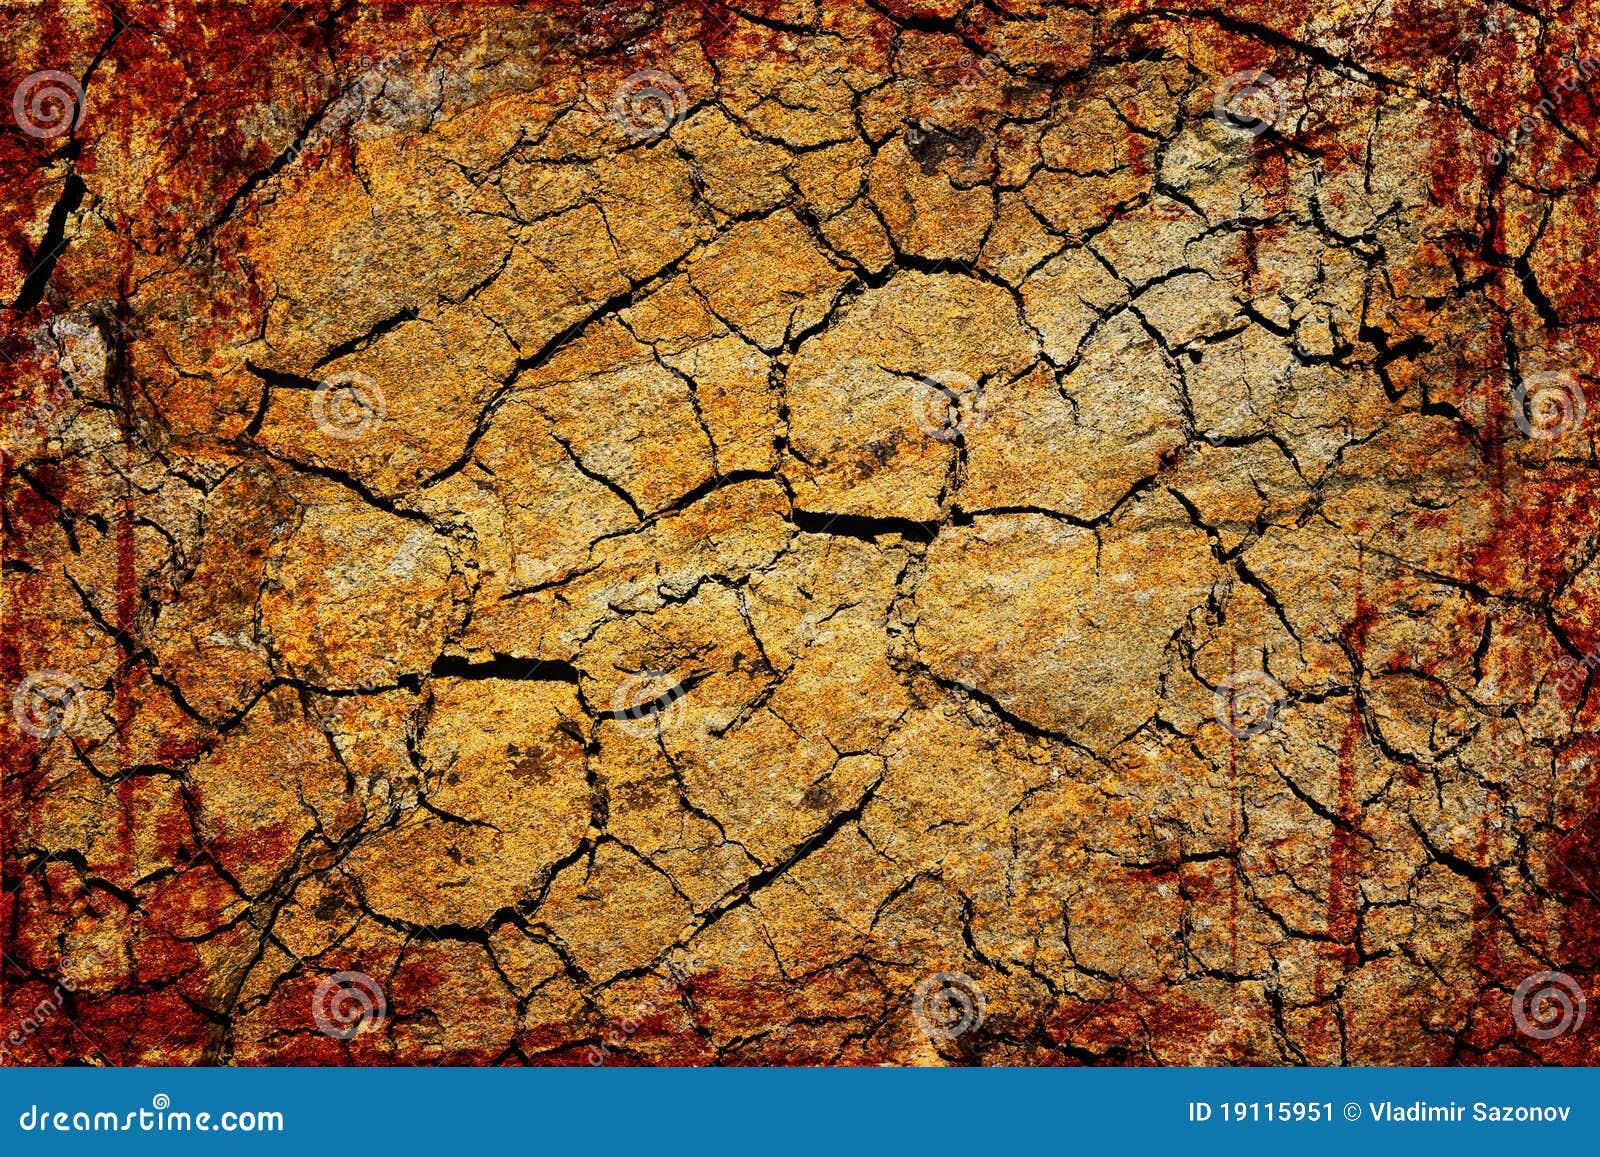 Textura de paredes agrietadas imagen de archivo imagen - Texturas de paredes ...